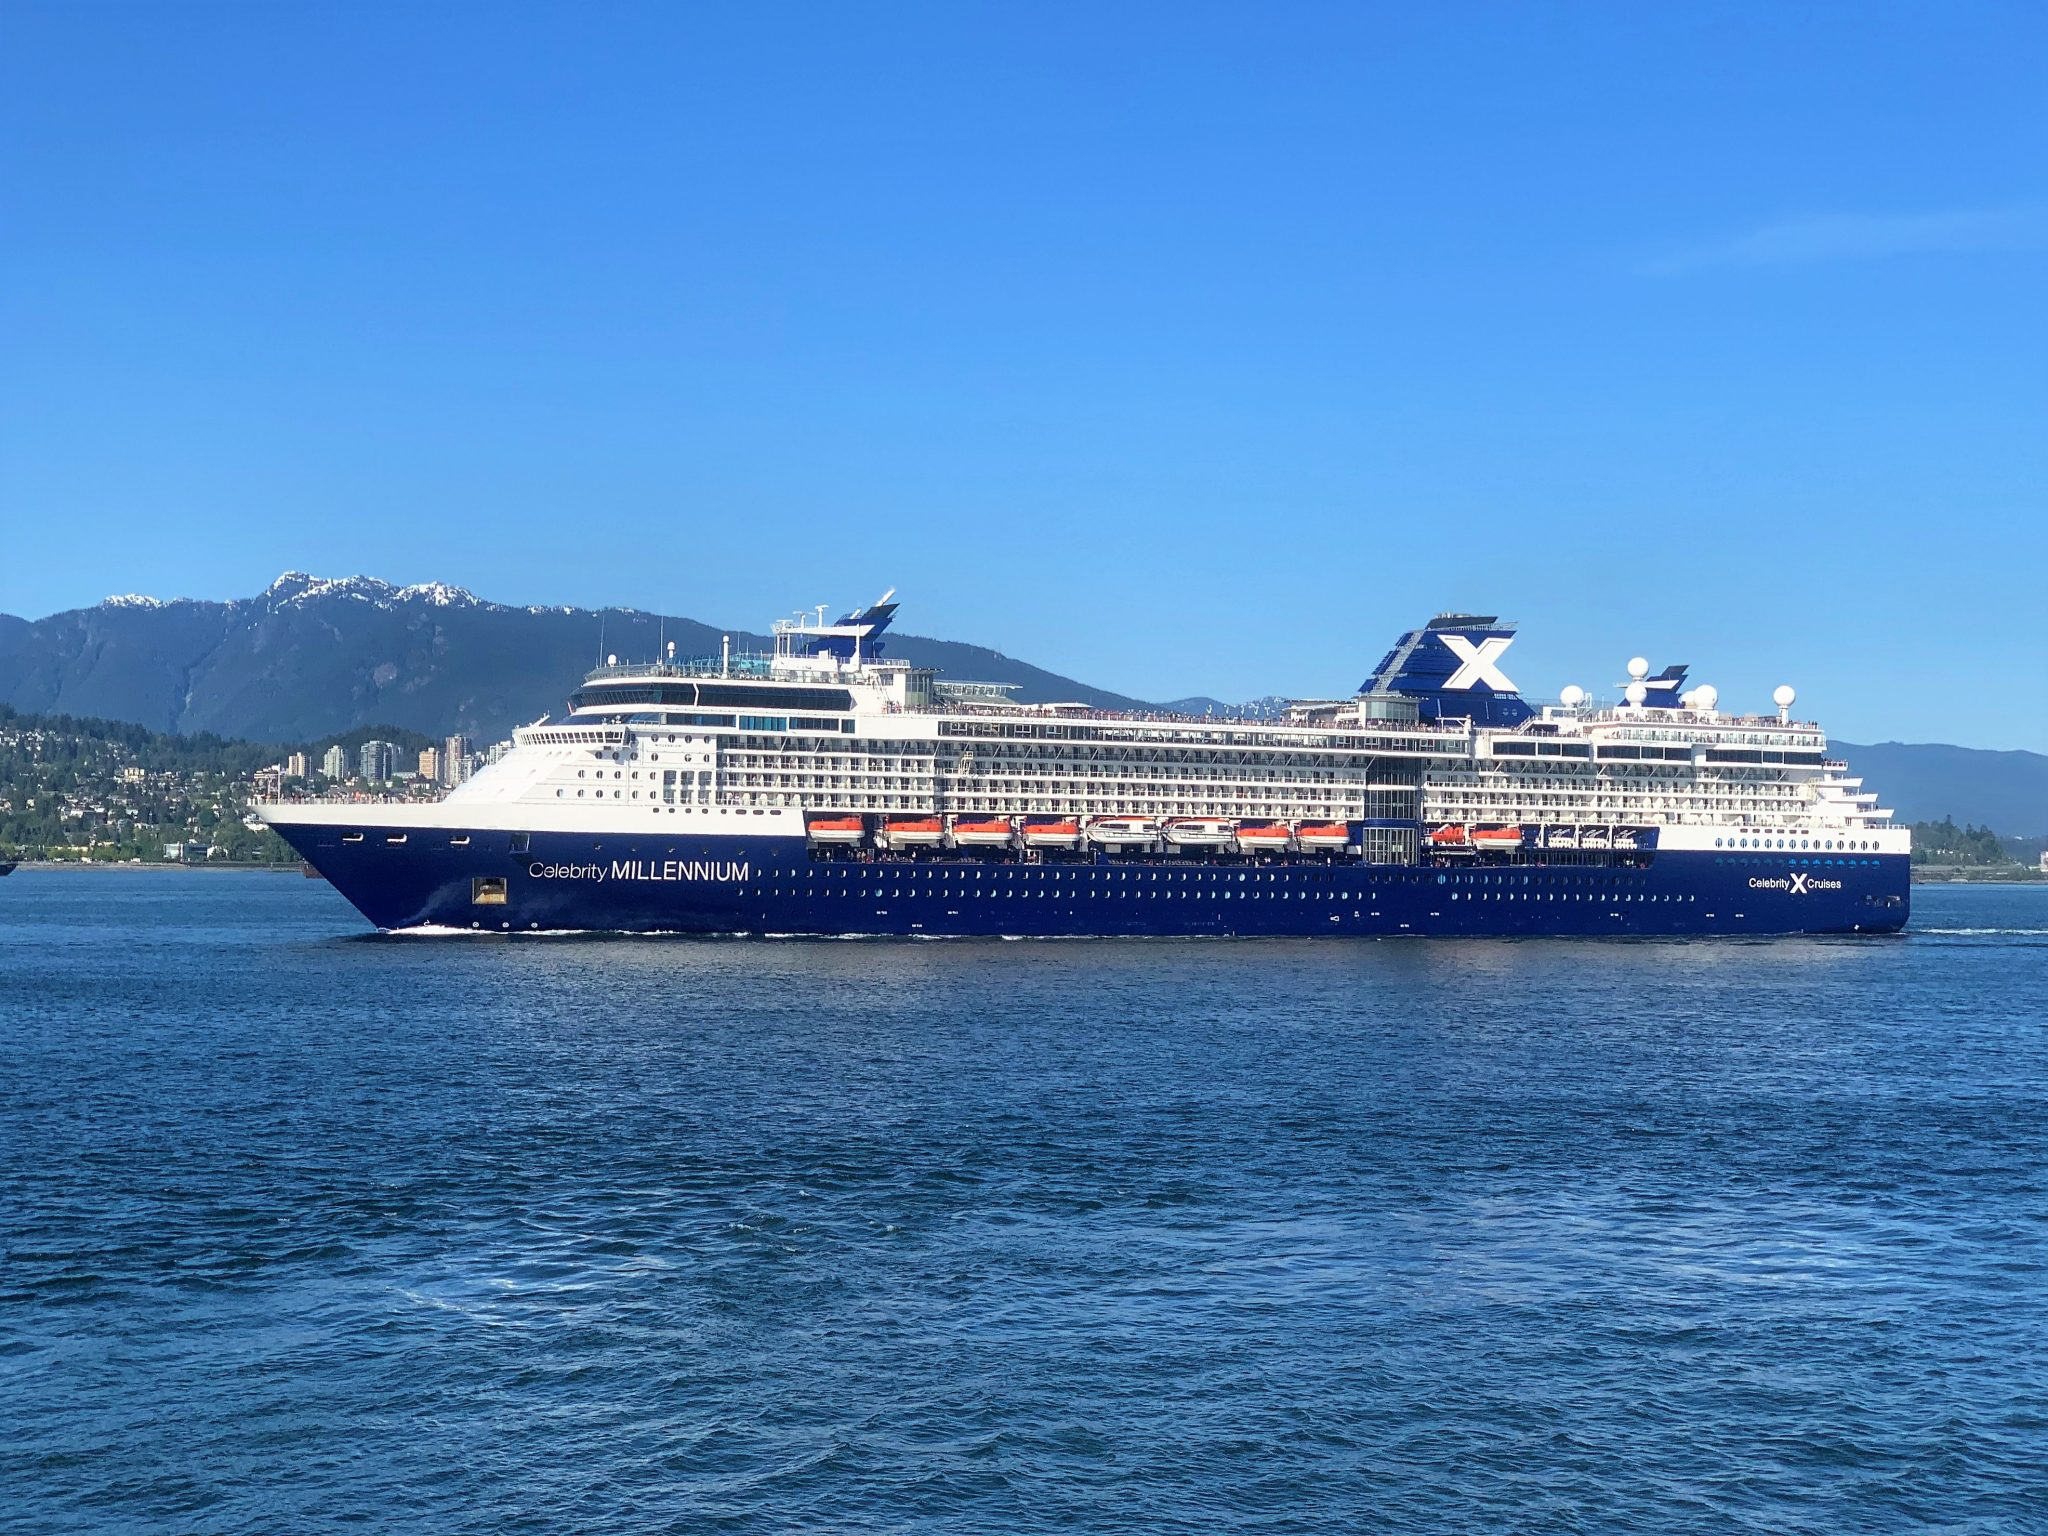 Best Alaskan Cruises 2020.Our Picks For Top Alaska Cruises In 2020 Eatsleepcruise Com